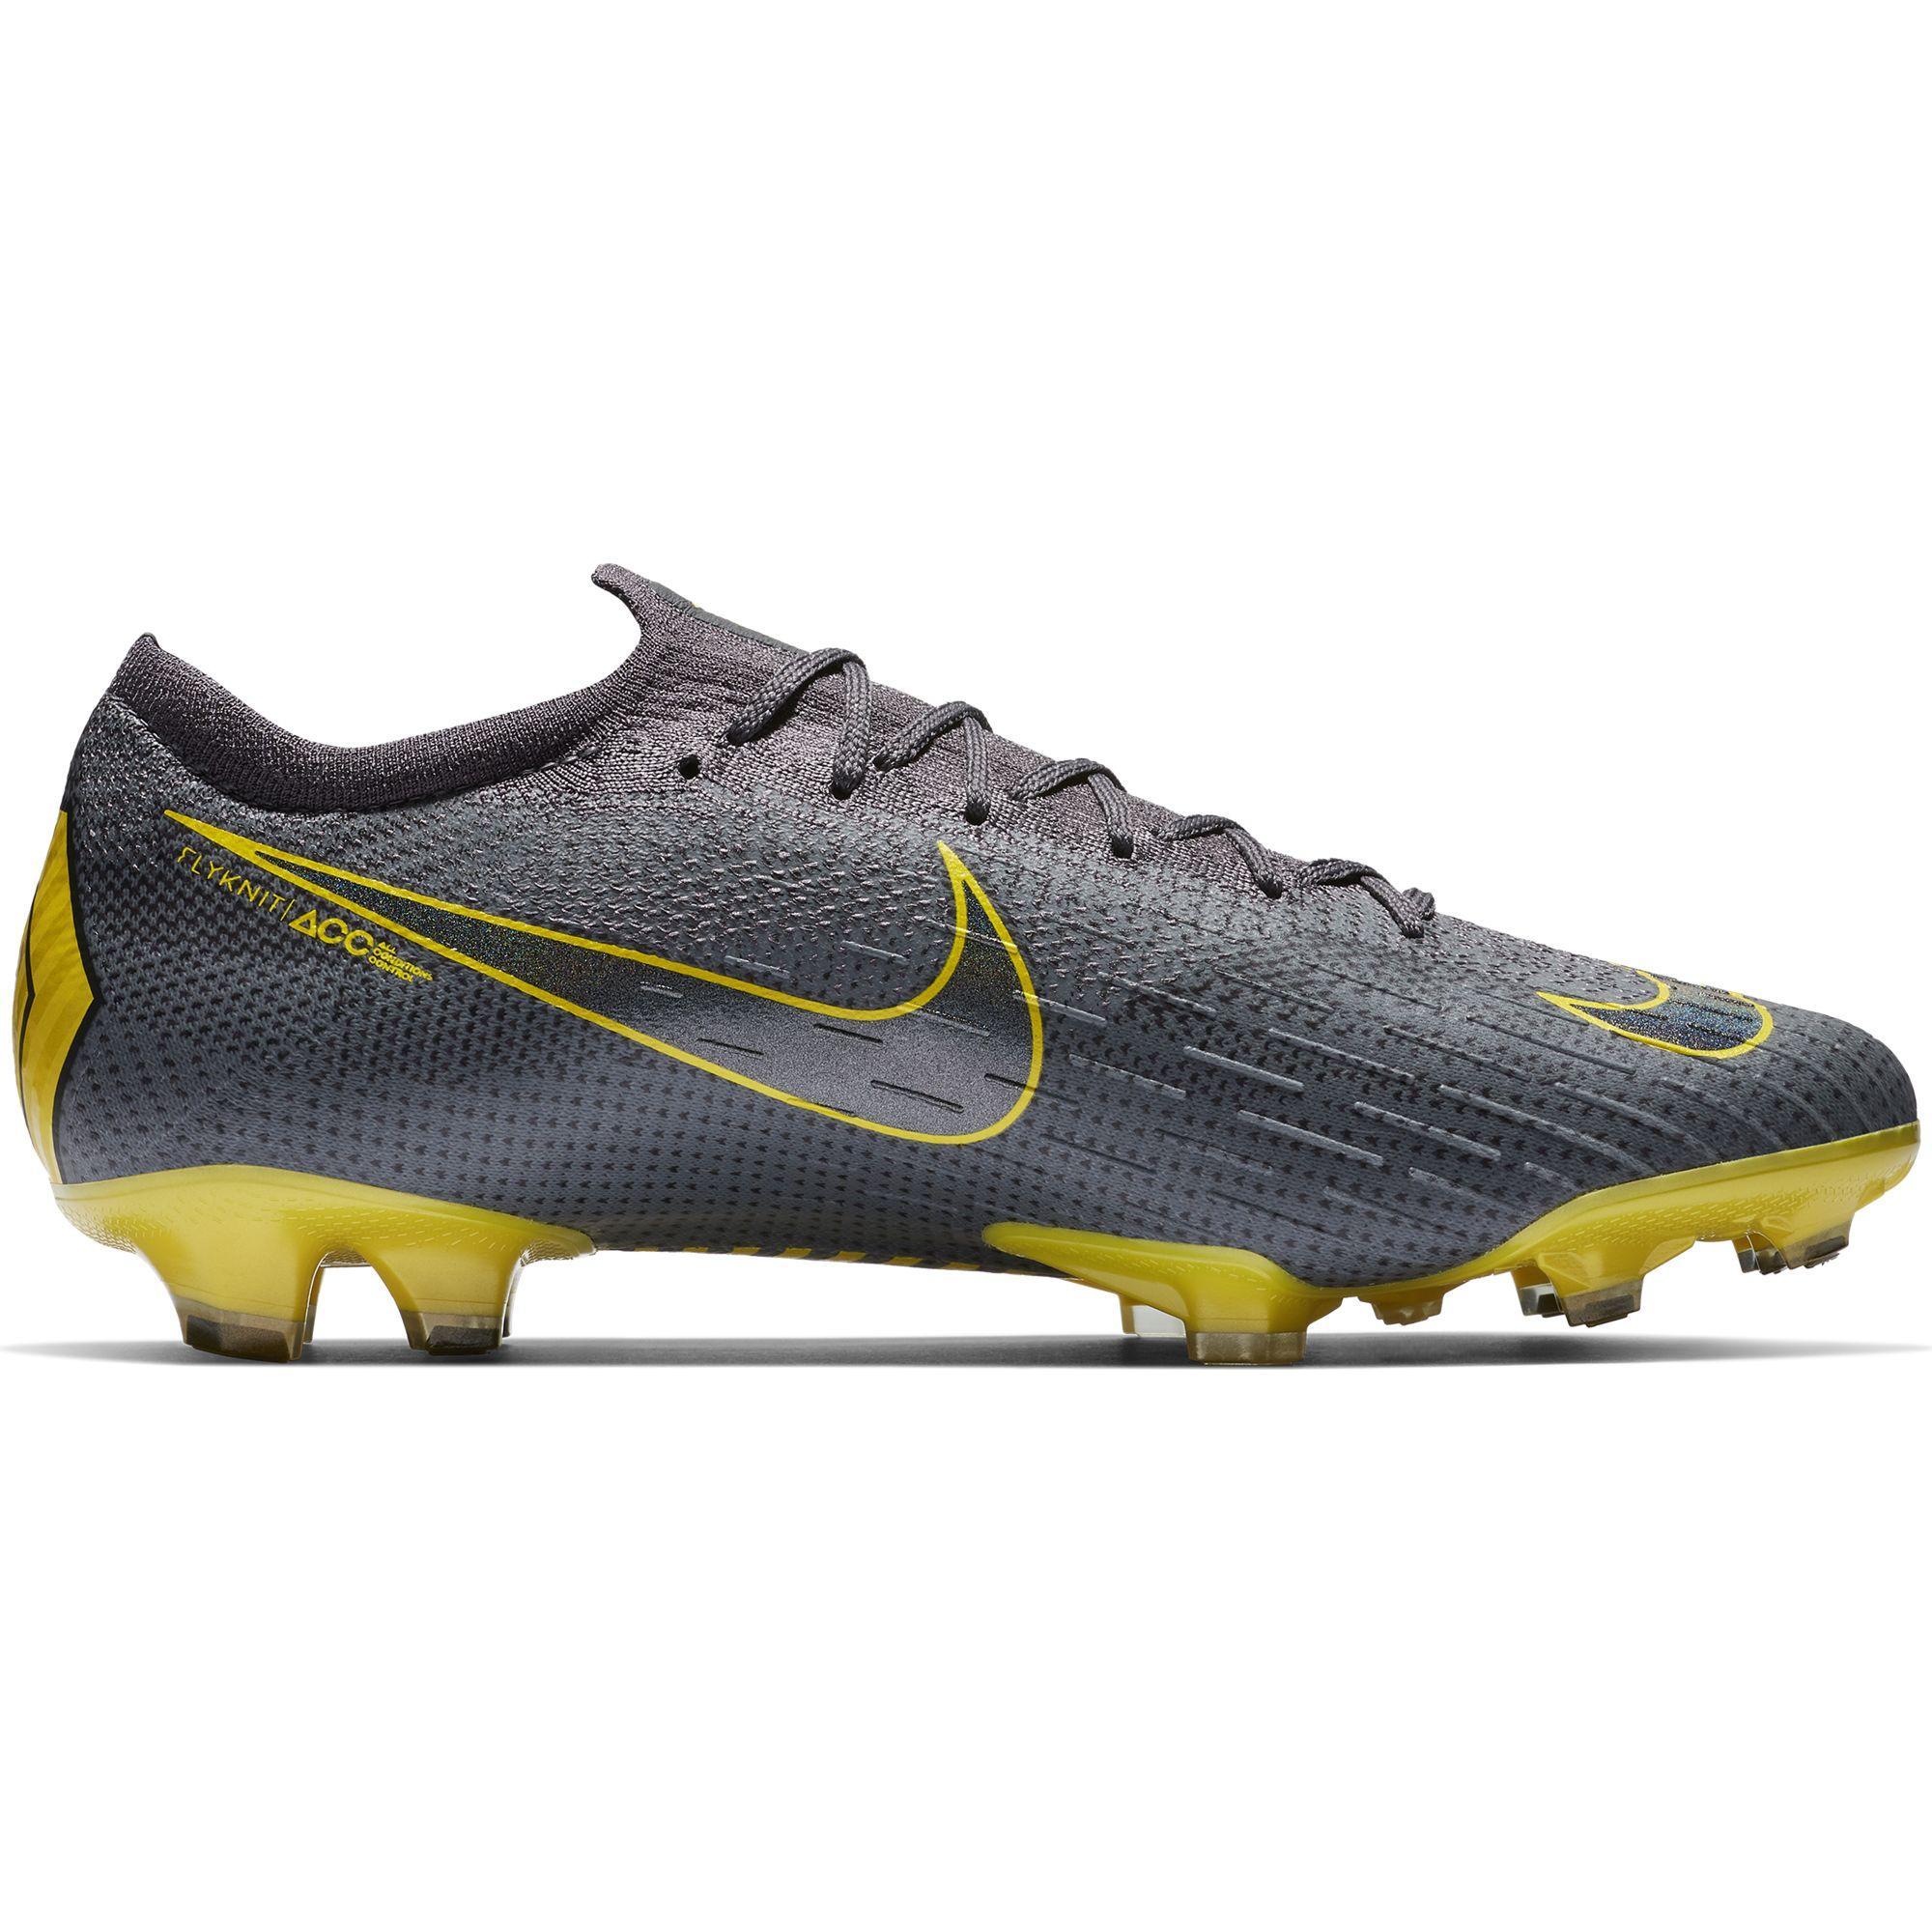 piuttosto fico scarpe casual anteprima di Nike Scarpe Calcio MERCURIAL VAPOR 360 ELITE FG